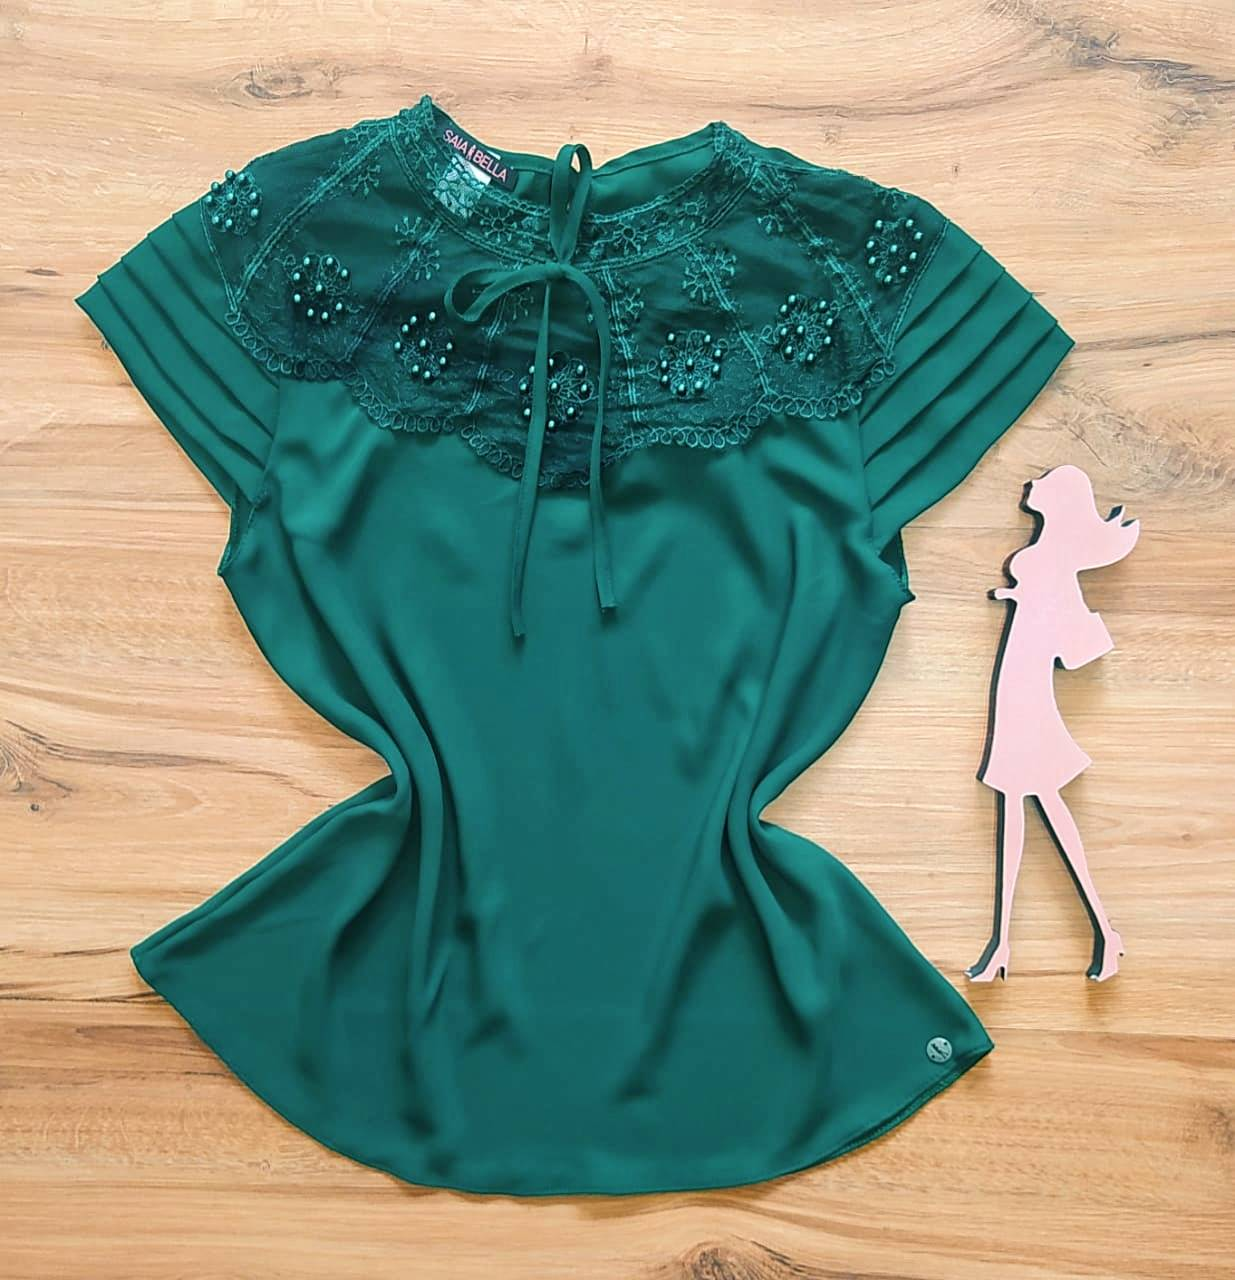 Blusa Luiza de Renda Saia Bella - SB840702 -  Verde